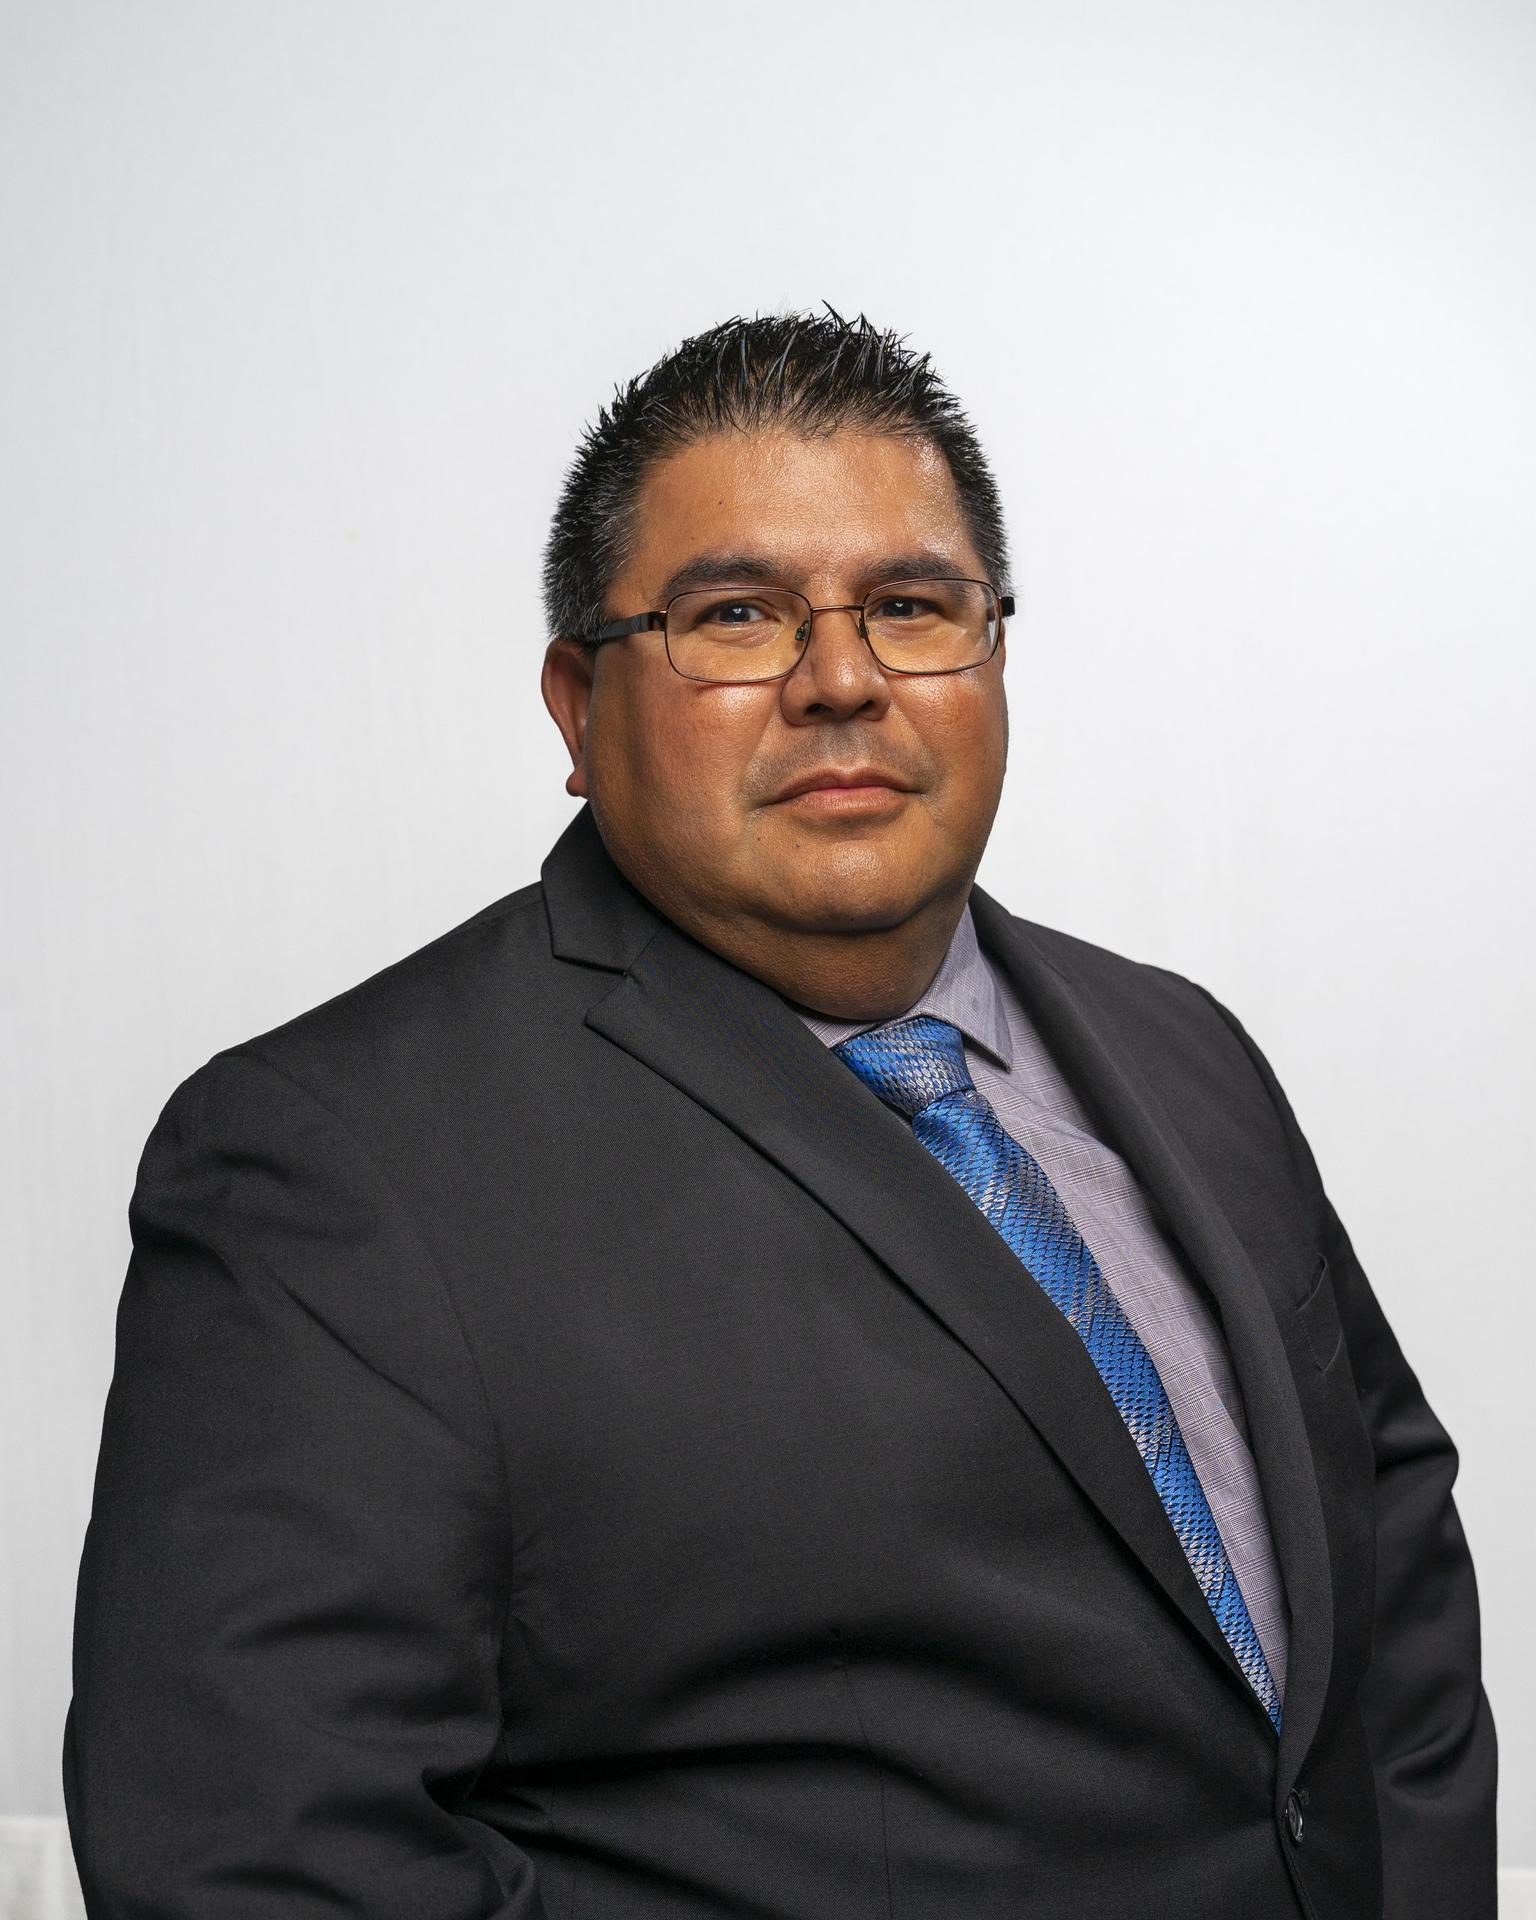 Carlos Jimenez, Assistant Band Director LAMS